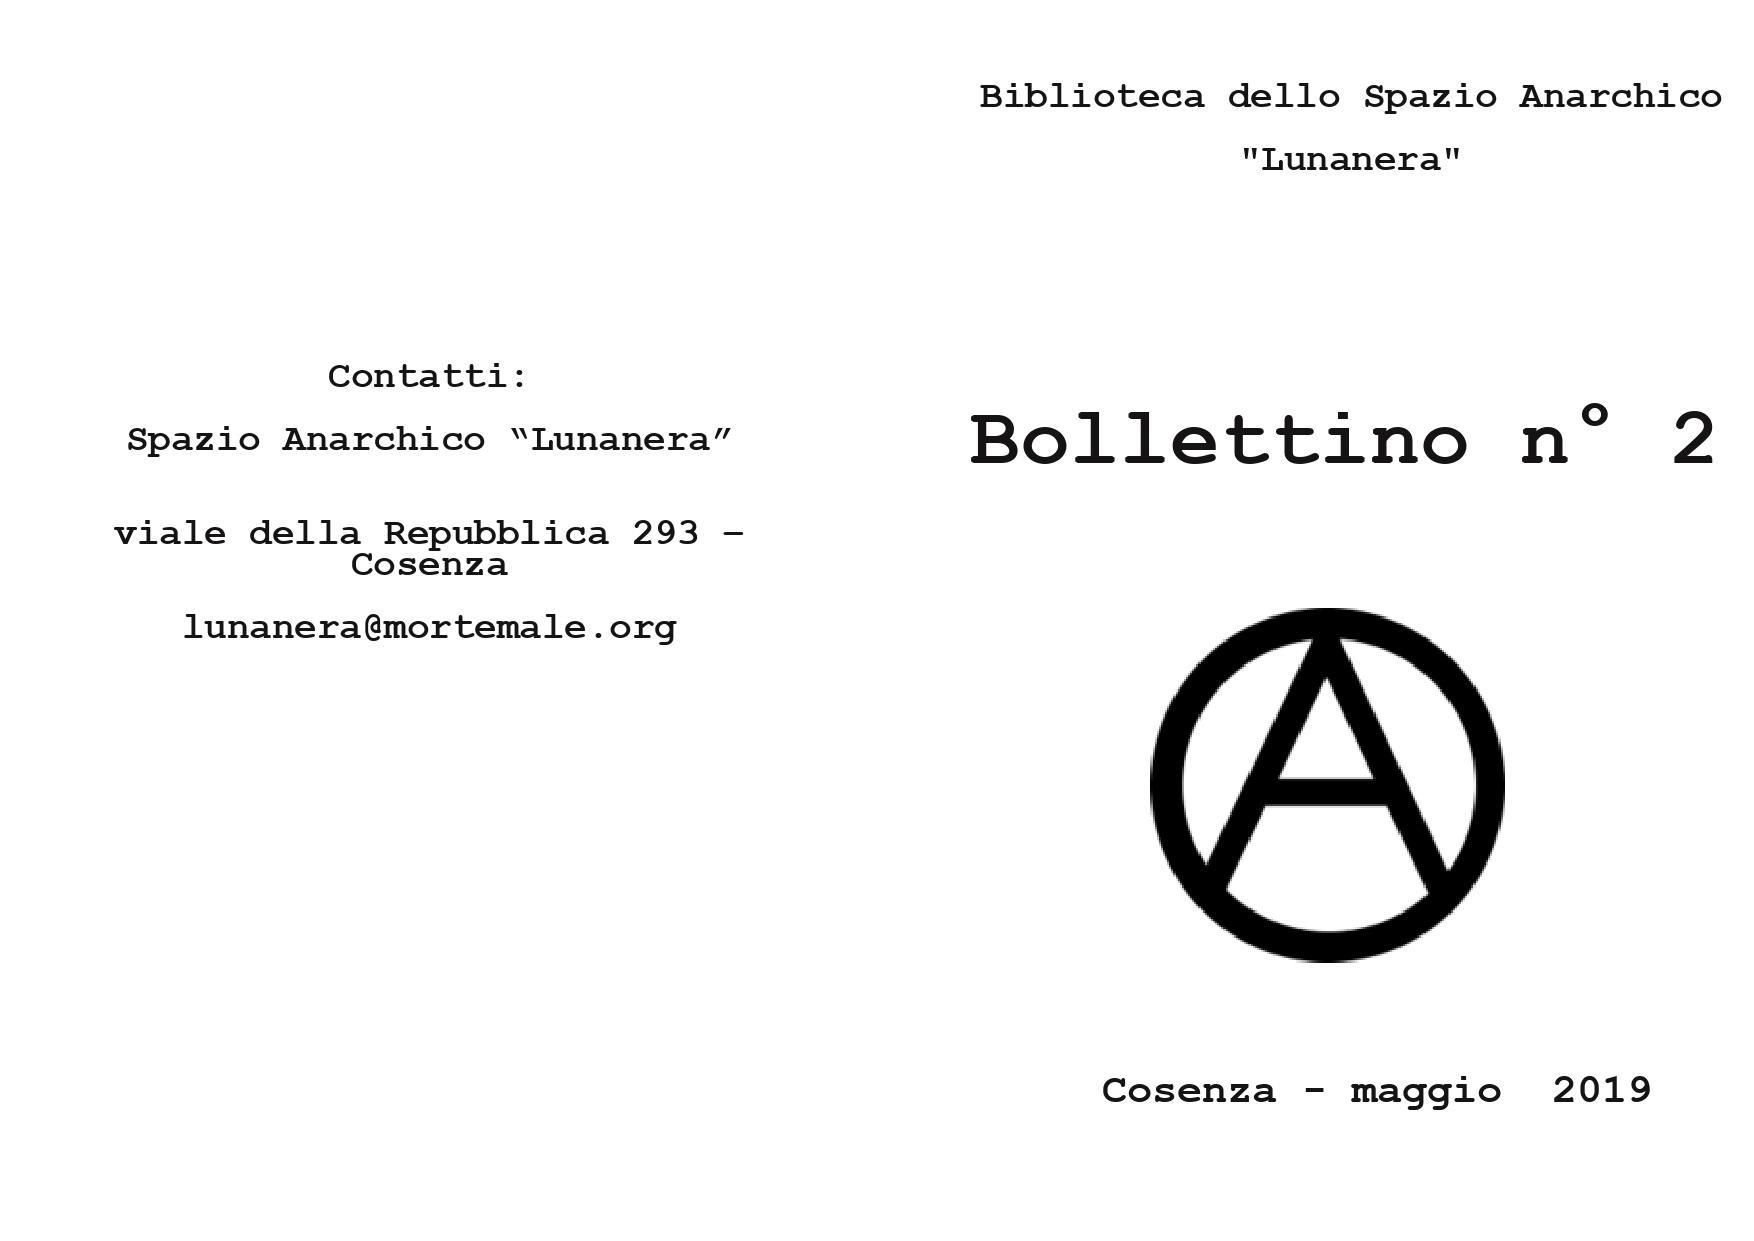 i-b-italia-bollettino-n-2-biblioteca-spazio-anarch-1.jpg